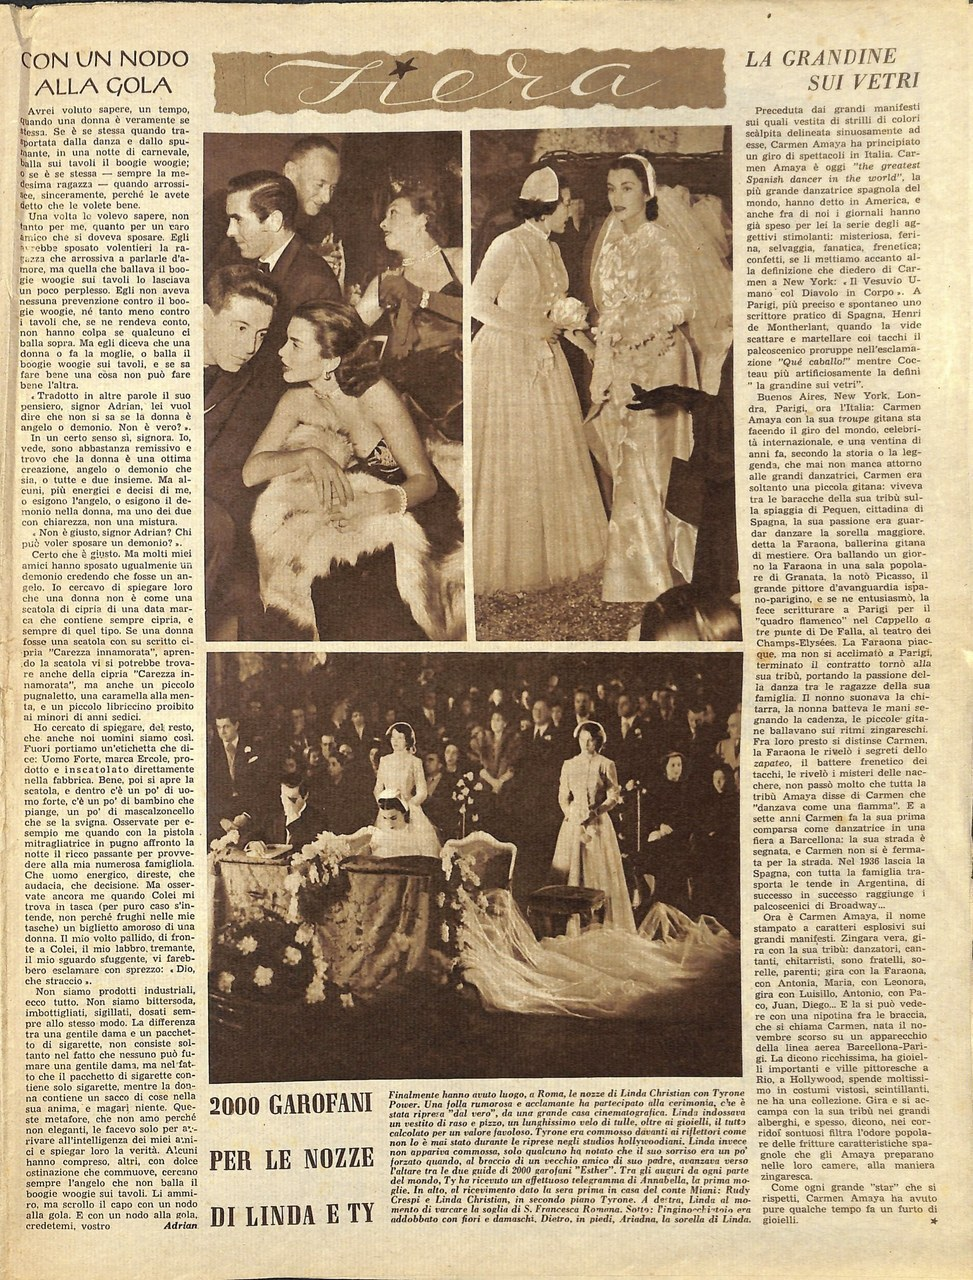 Il matrimonio di Linda Christian, Annabella, n.7, 13 febbraio 1949